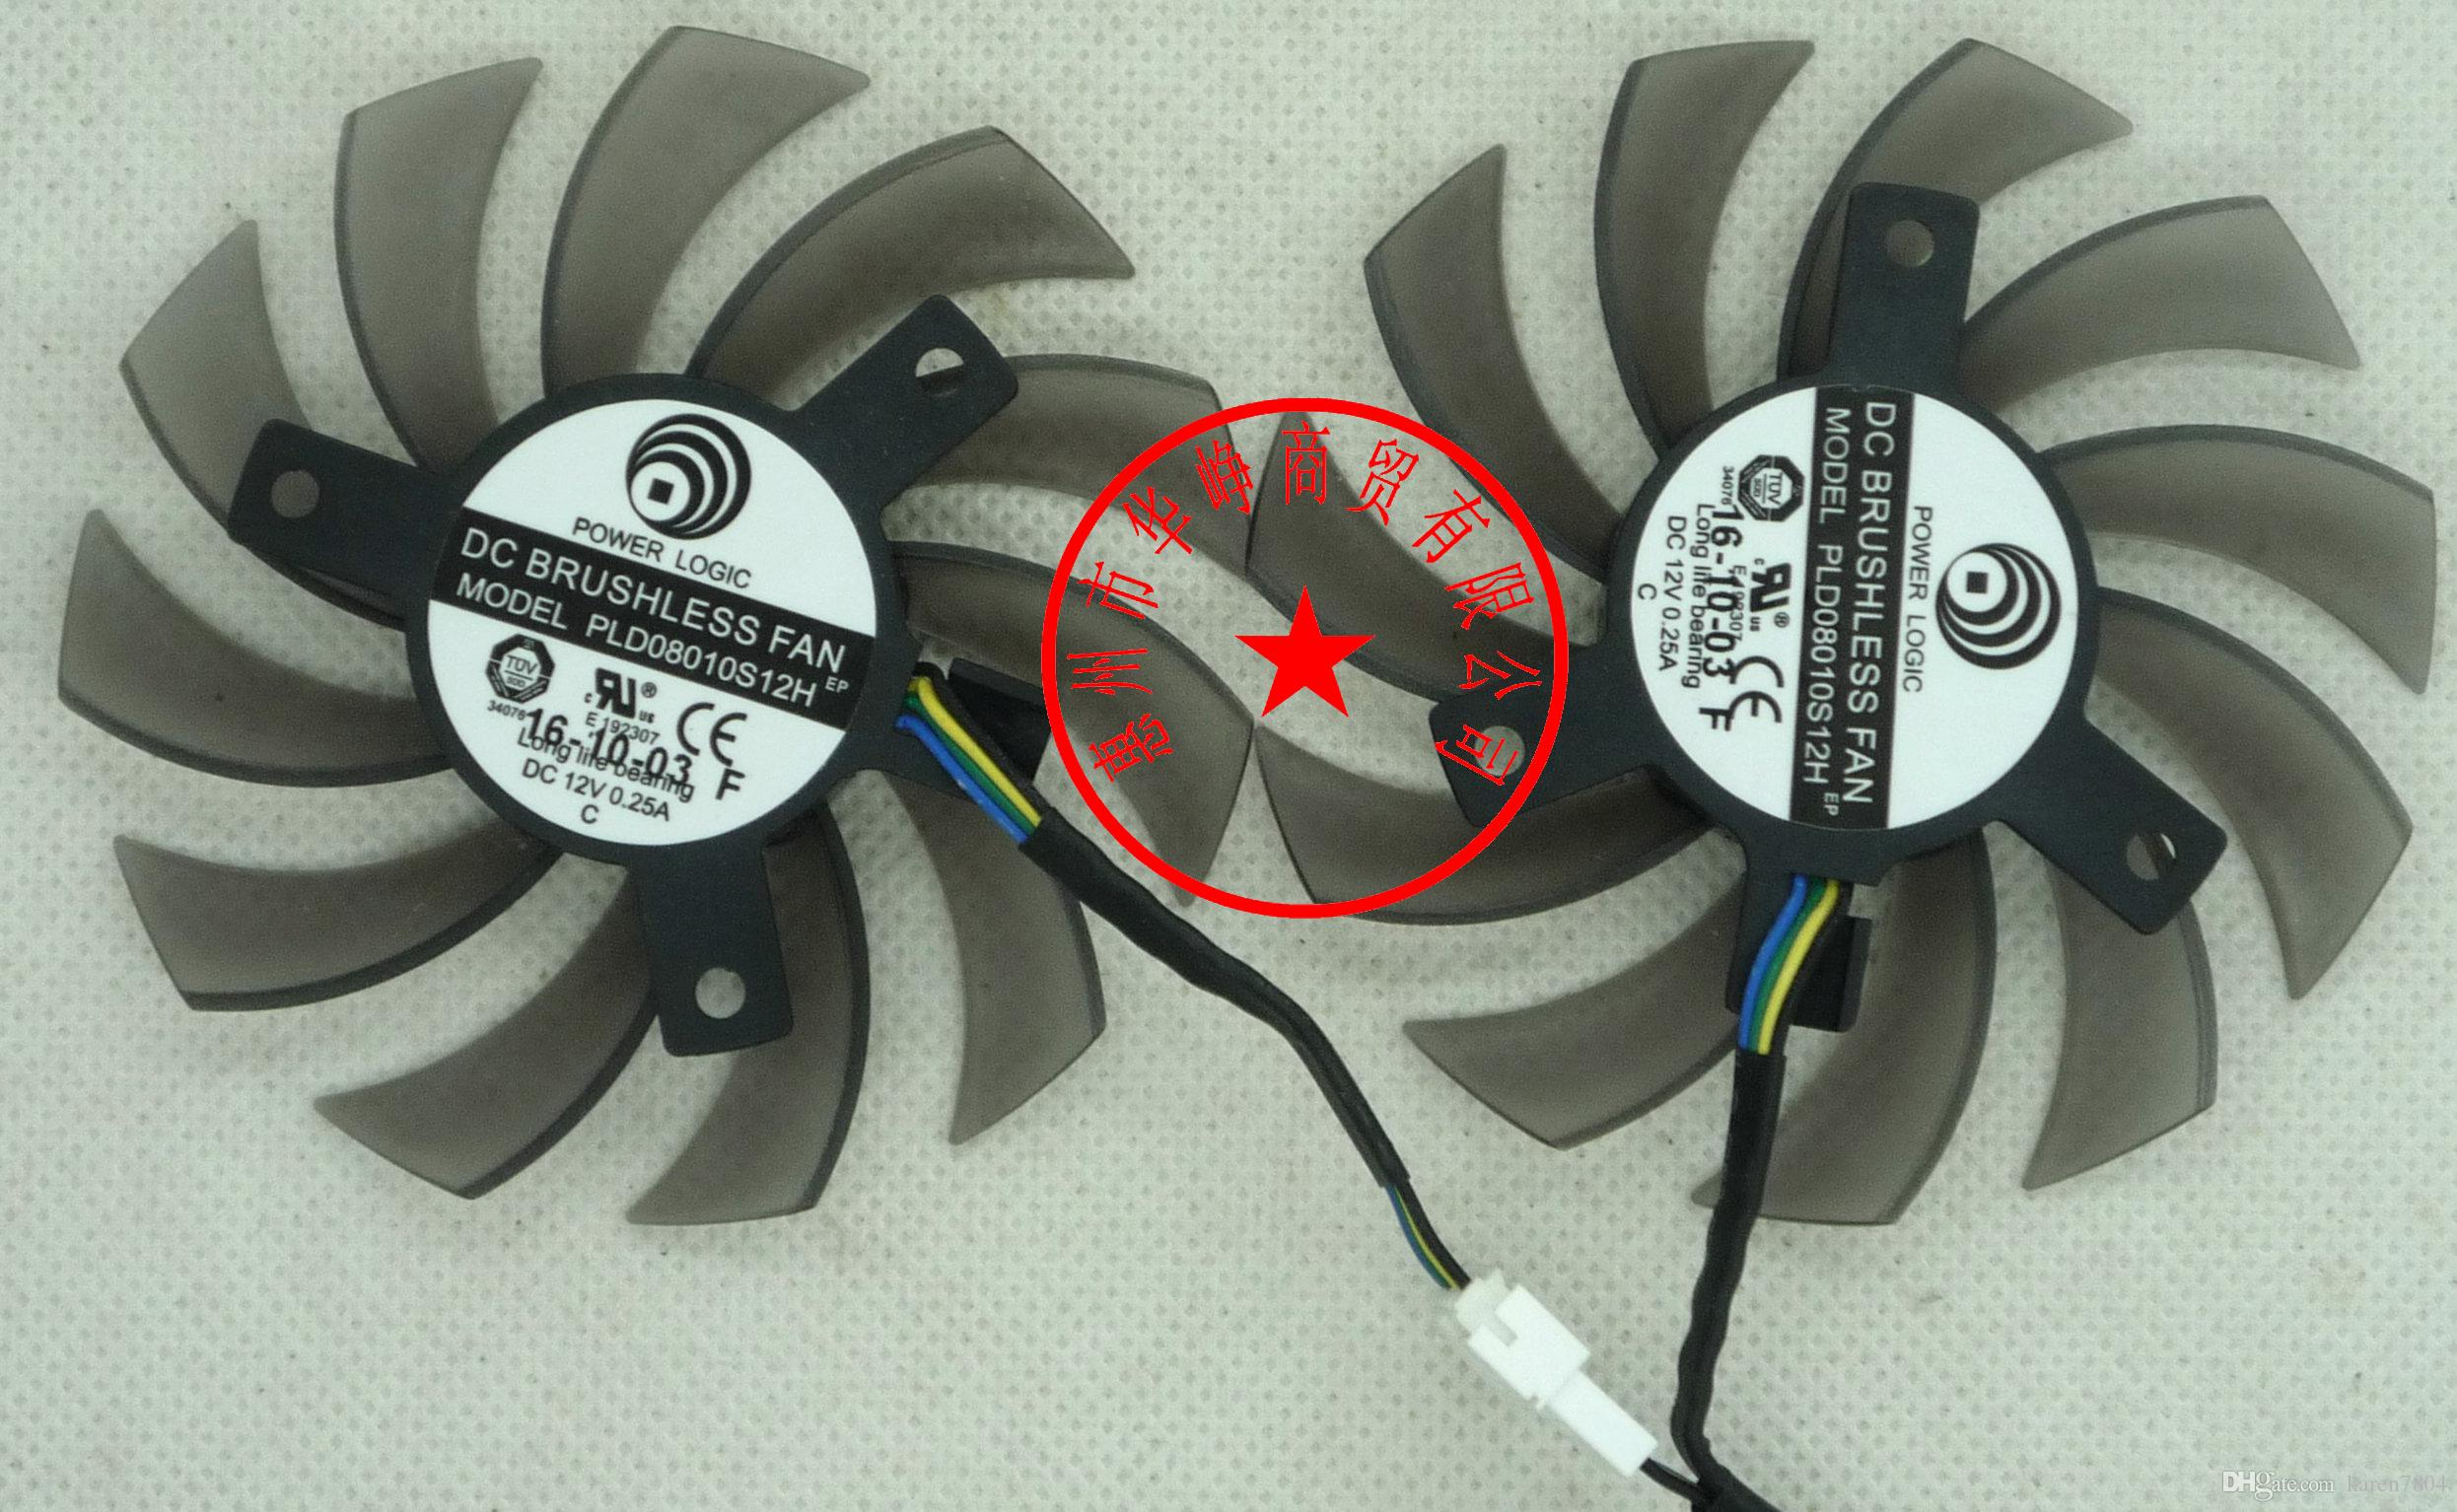 MSI 460GTX 560GTX 570GTX 580GTX R6790 R6870 R6850HAWK PLD08010S12HH PLD08010S12H ventilador de la tarjeta gráfica